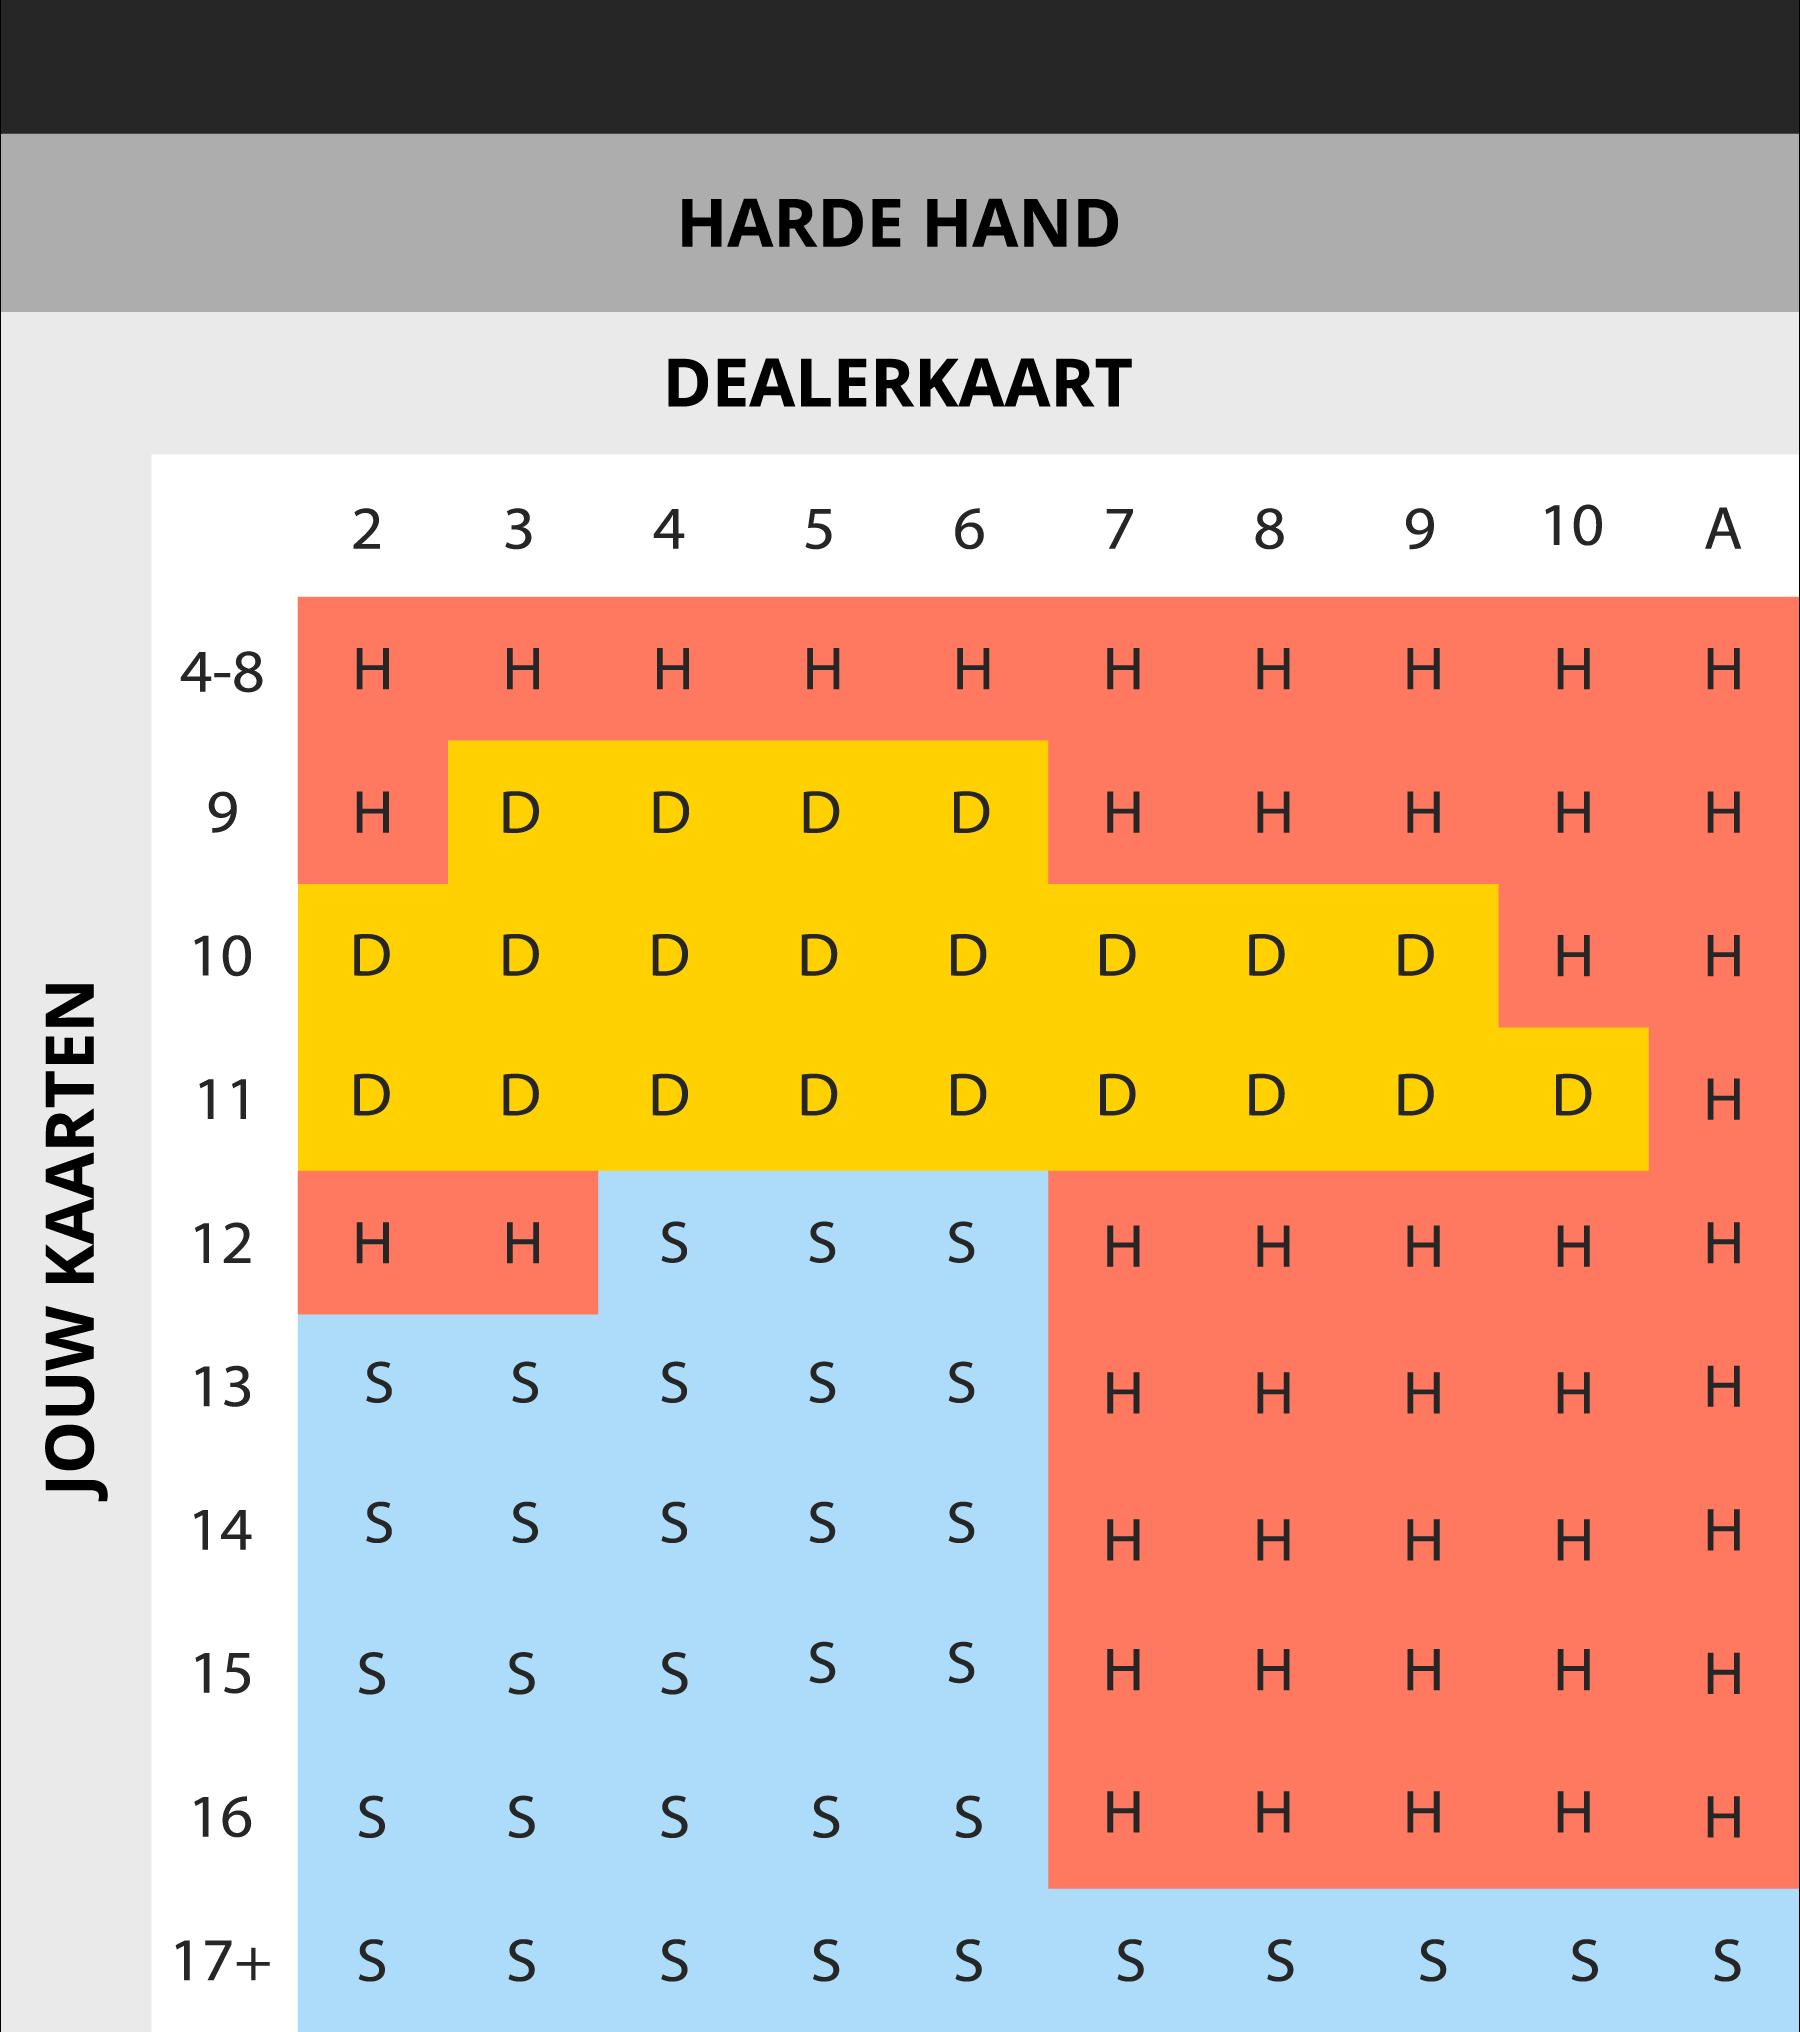 Blackjack Basisstrategie: harde handen (hard totals)